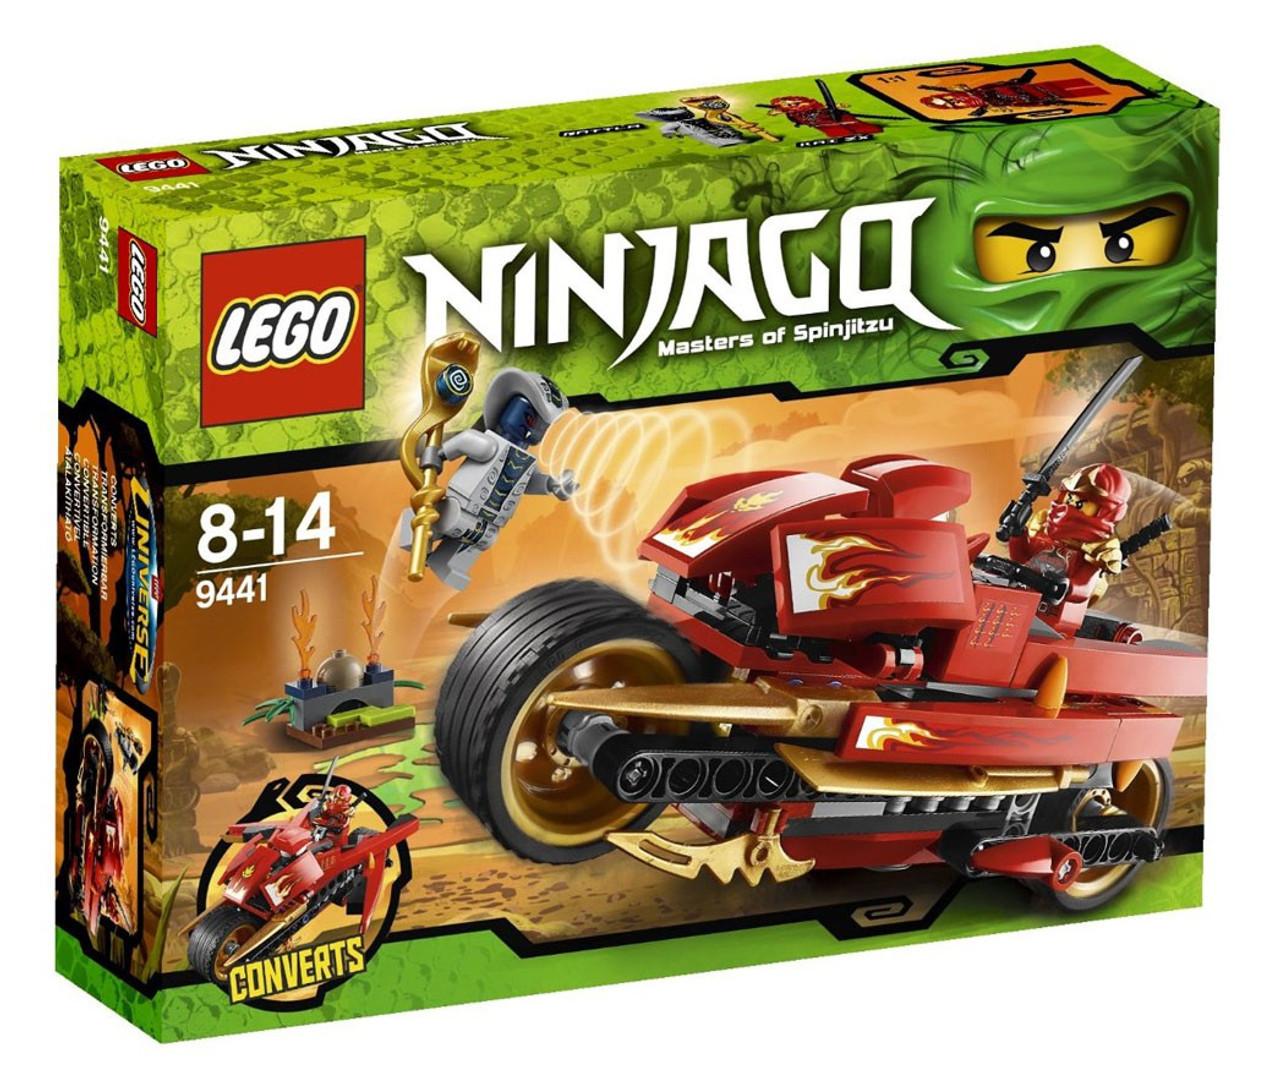 LEGO Ninjago Kai's Blade Cycle Set #9441